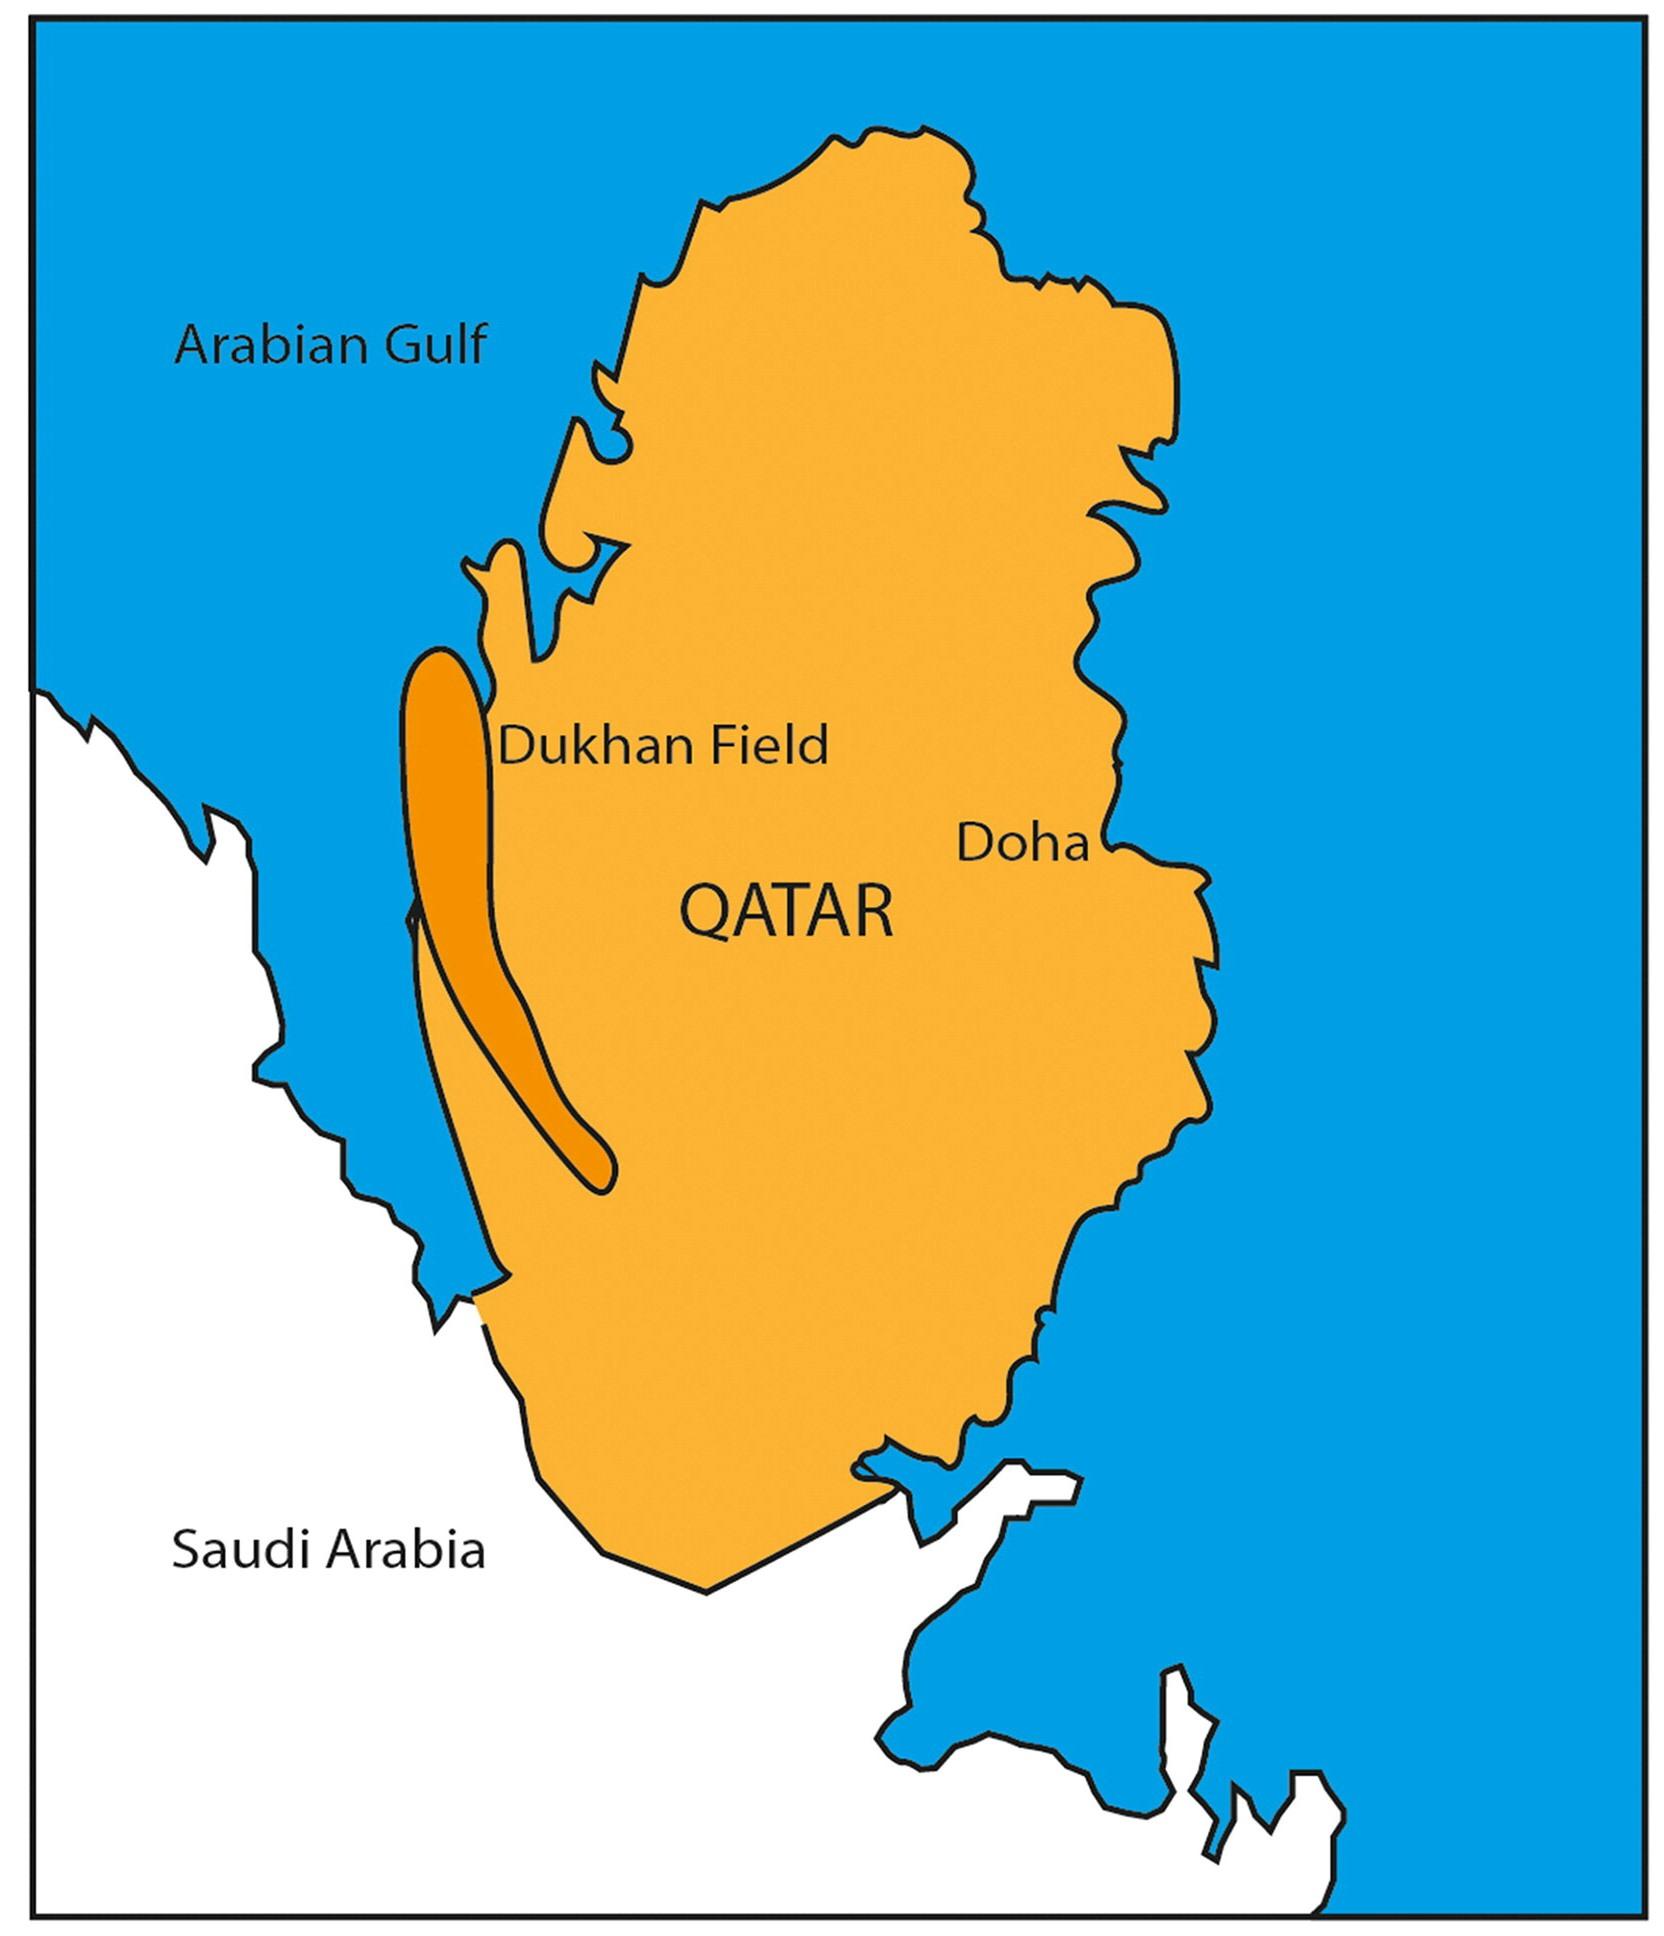 Scientific Journals Publications | Qatar University